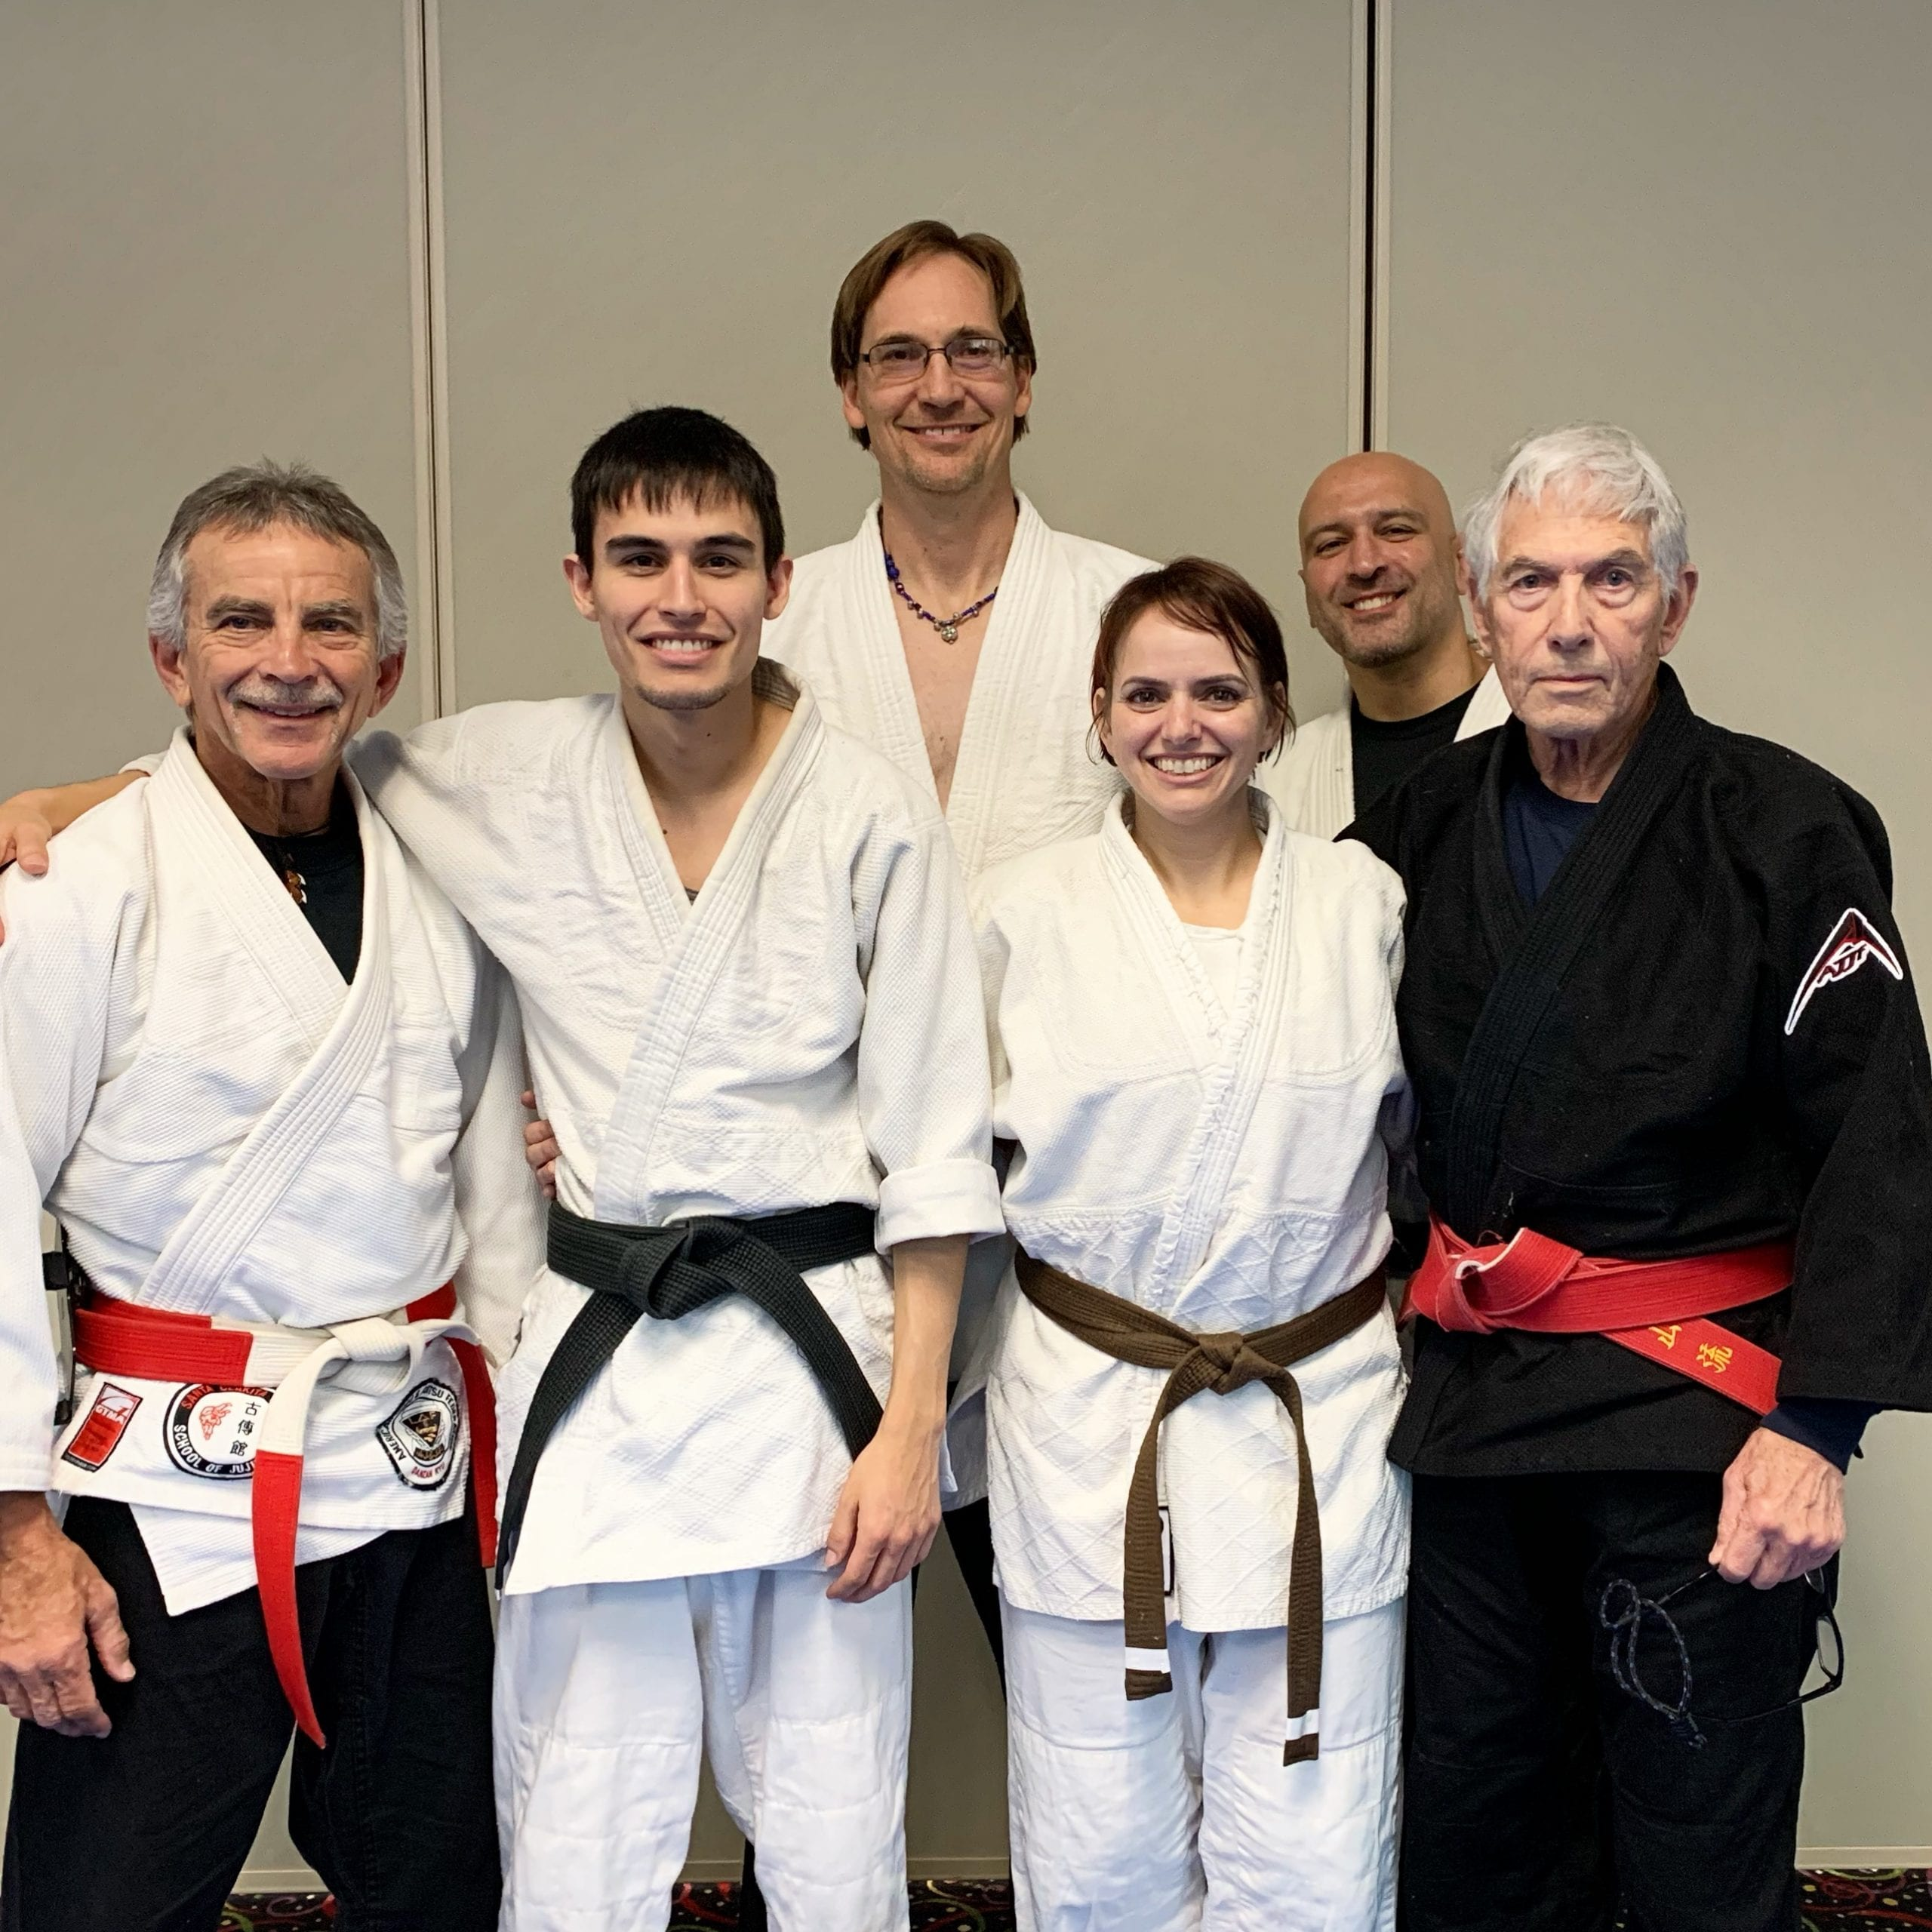 Dolly Wyatt Shodan. Dec 6, 2019. Examiners: Senior Prof Tom Ball, Prof Kevin Colton, Sensei Keith Thompson. Uke Zachary Chiara.